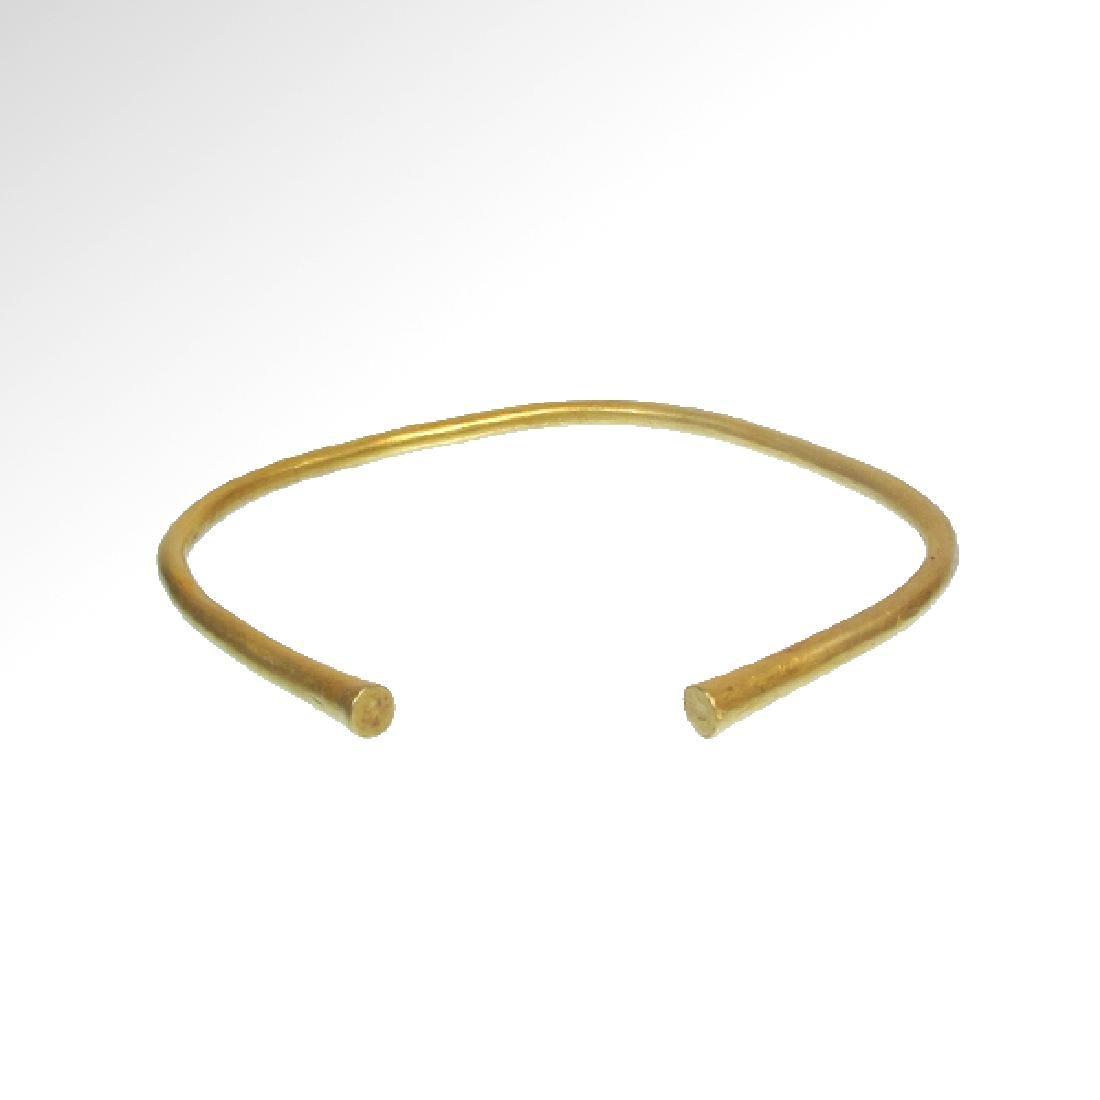 Greek Gold Bracelet, 5th-3rd Century B.C. - 3